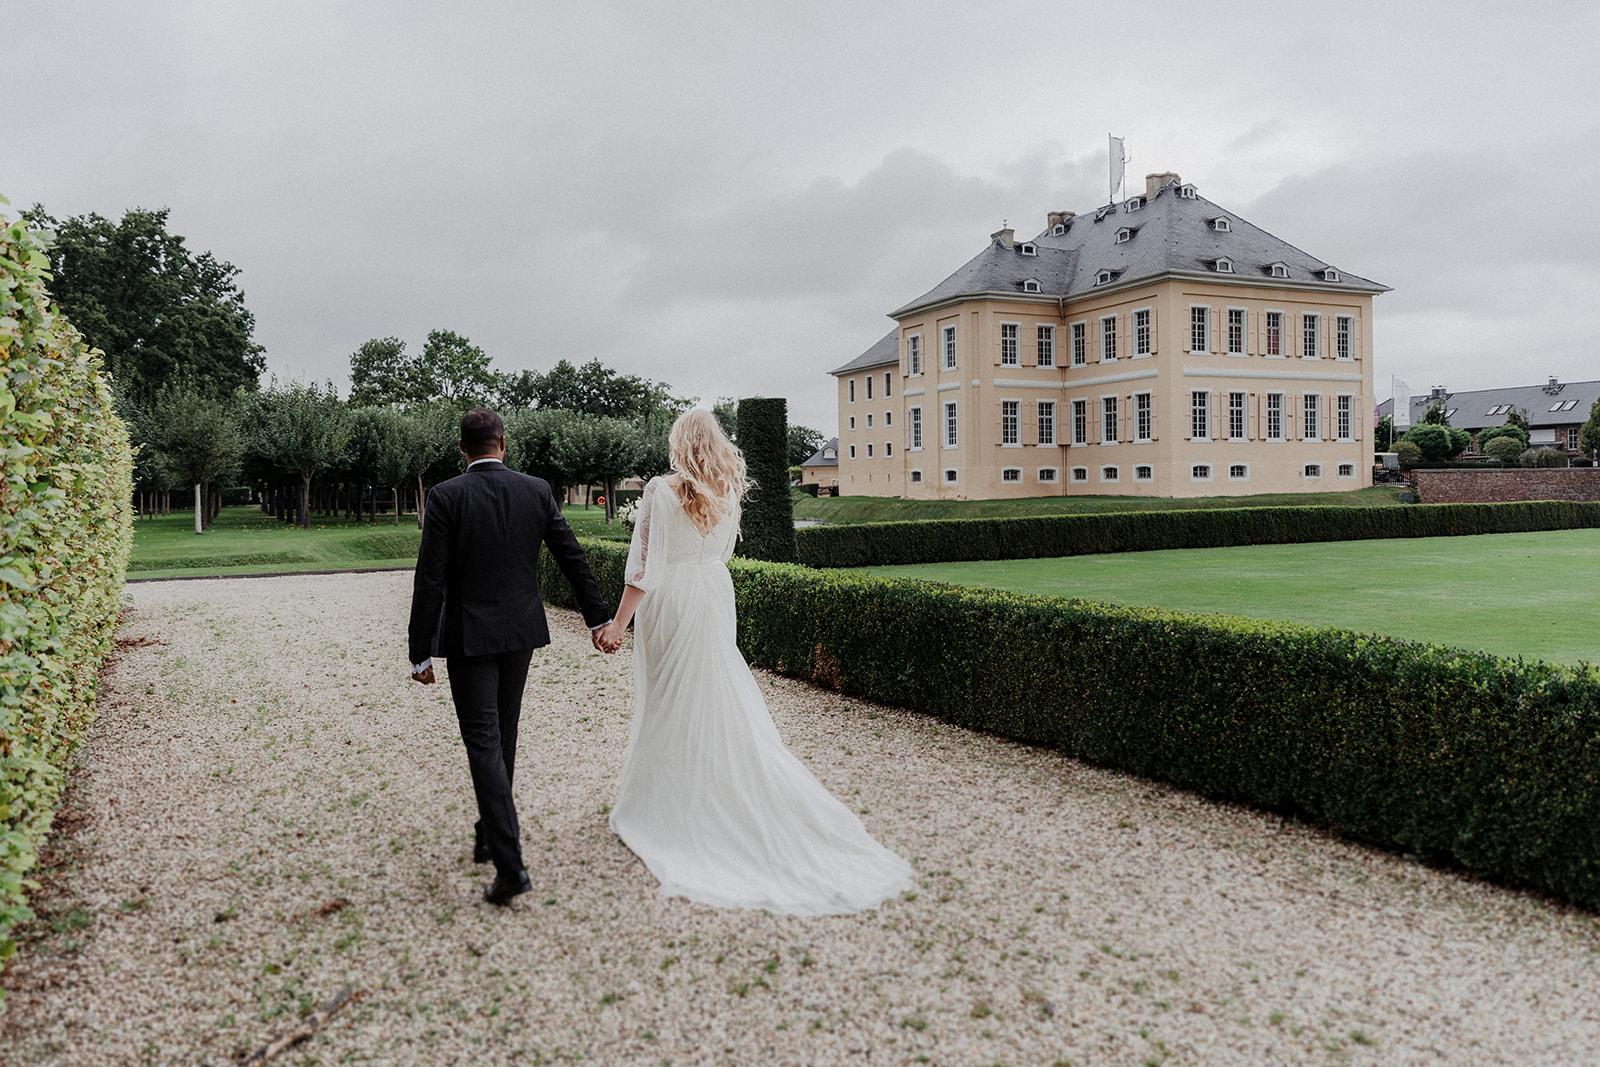 Braut und Bräutigam vor Schloss Miel